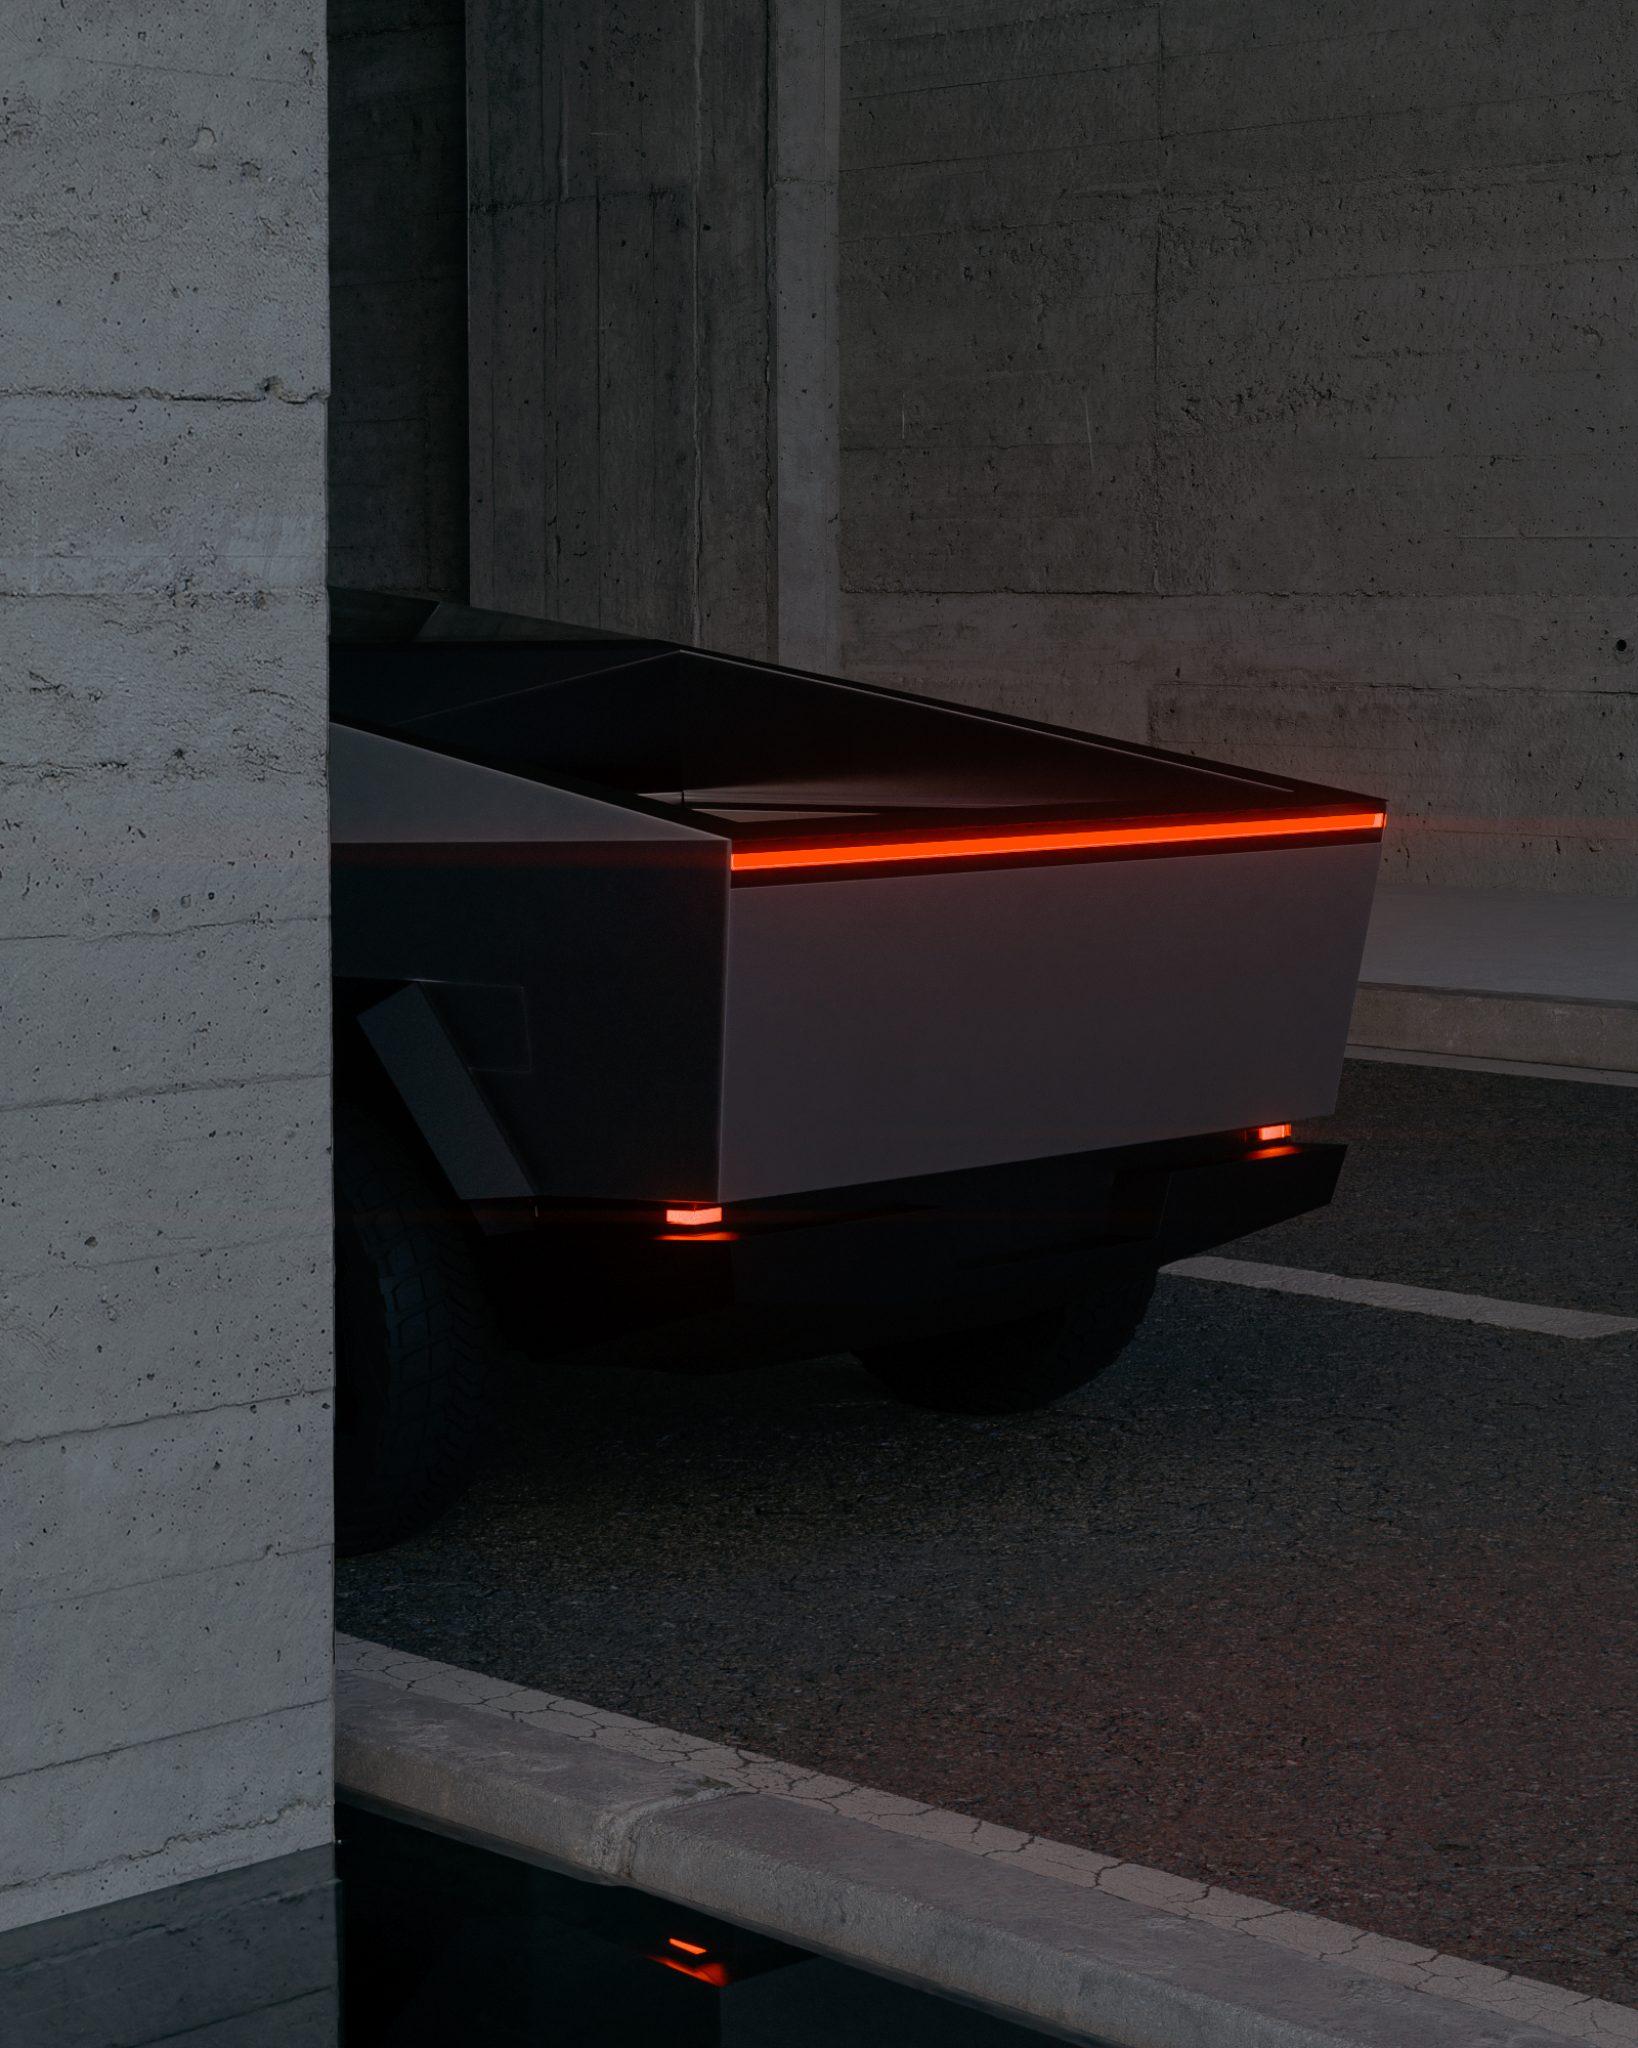 ignant-tesla-cybertruck-cgi-brutalism-cgi-editorial-3-1638×2048